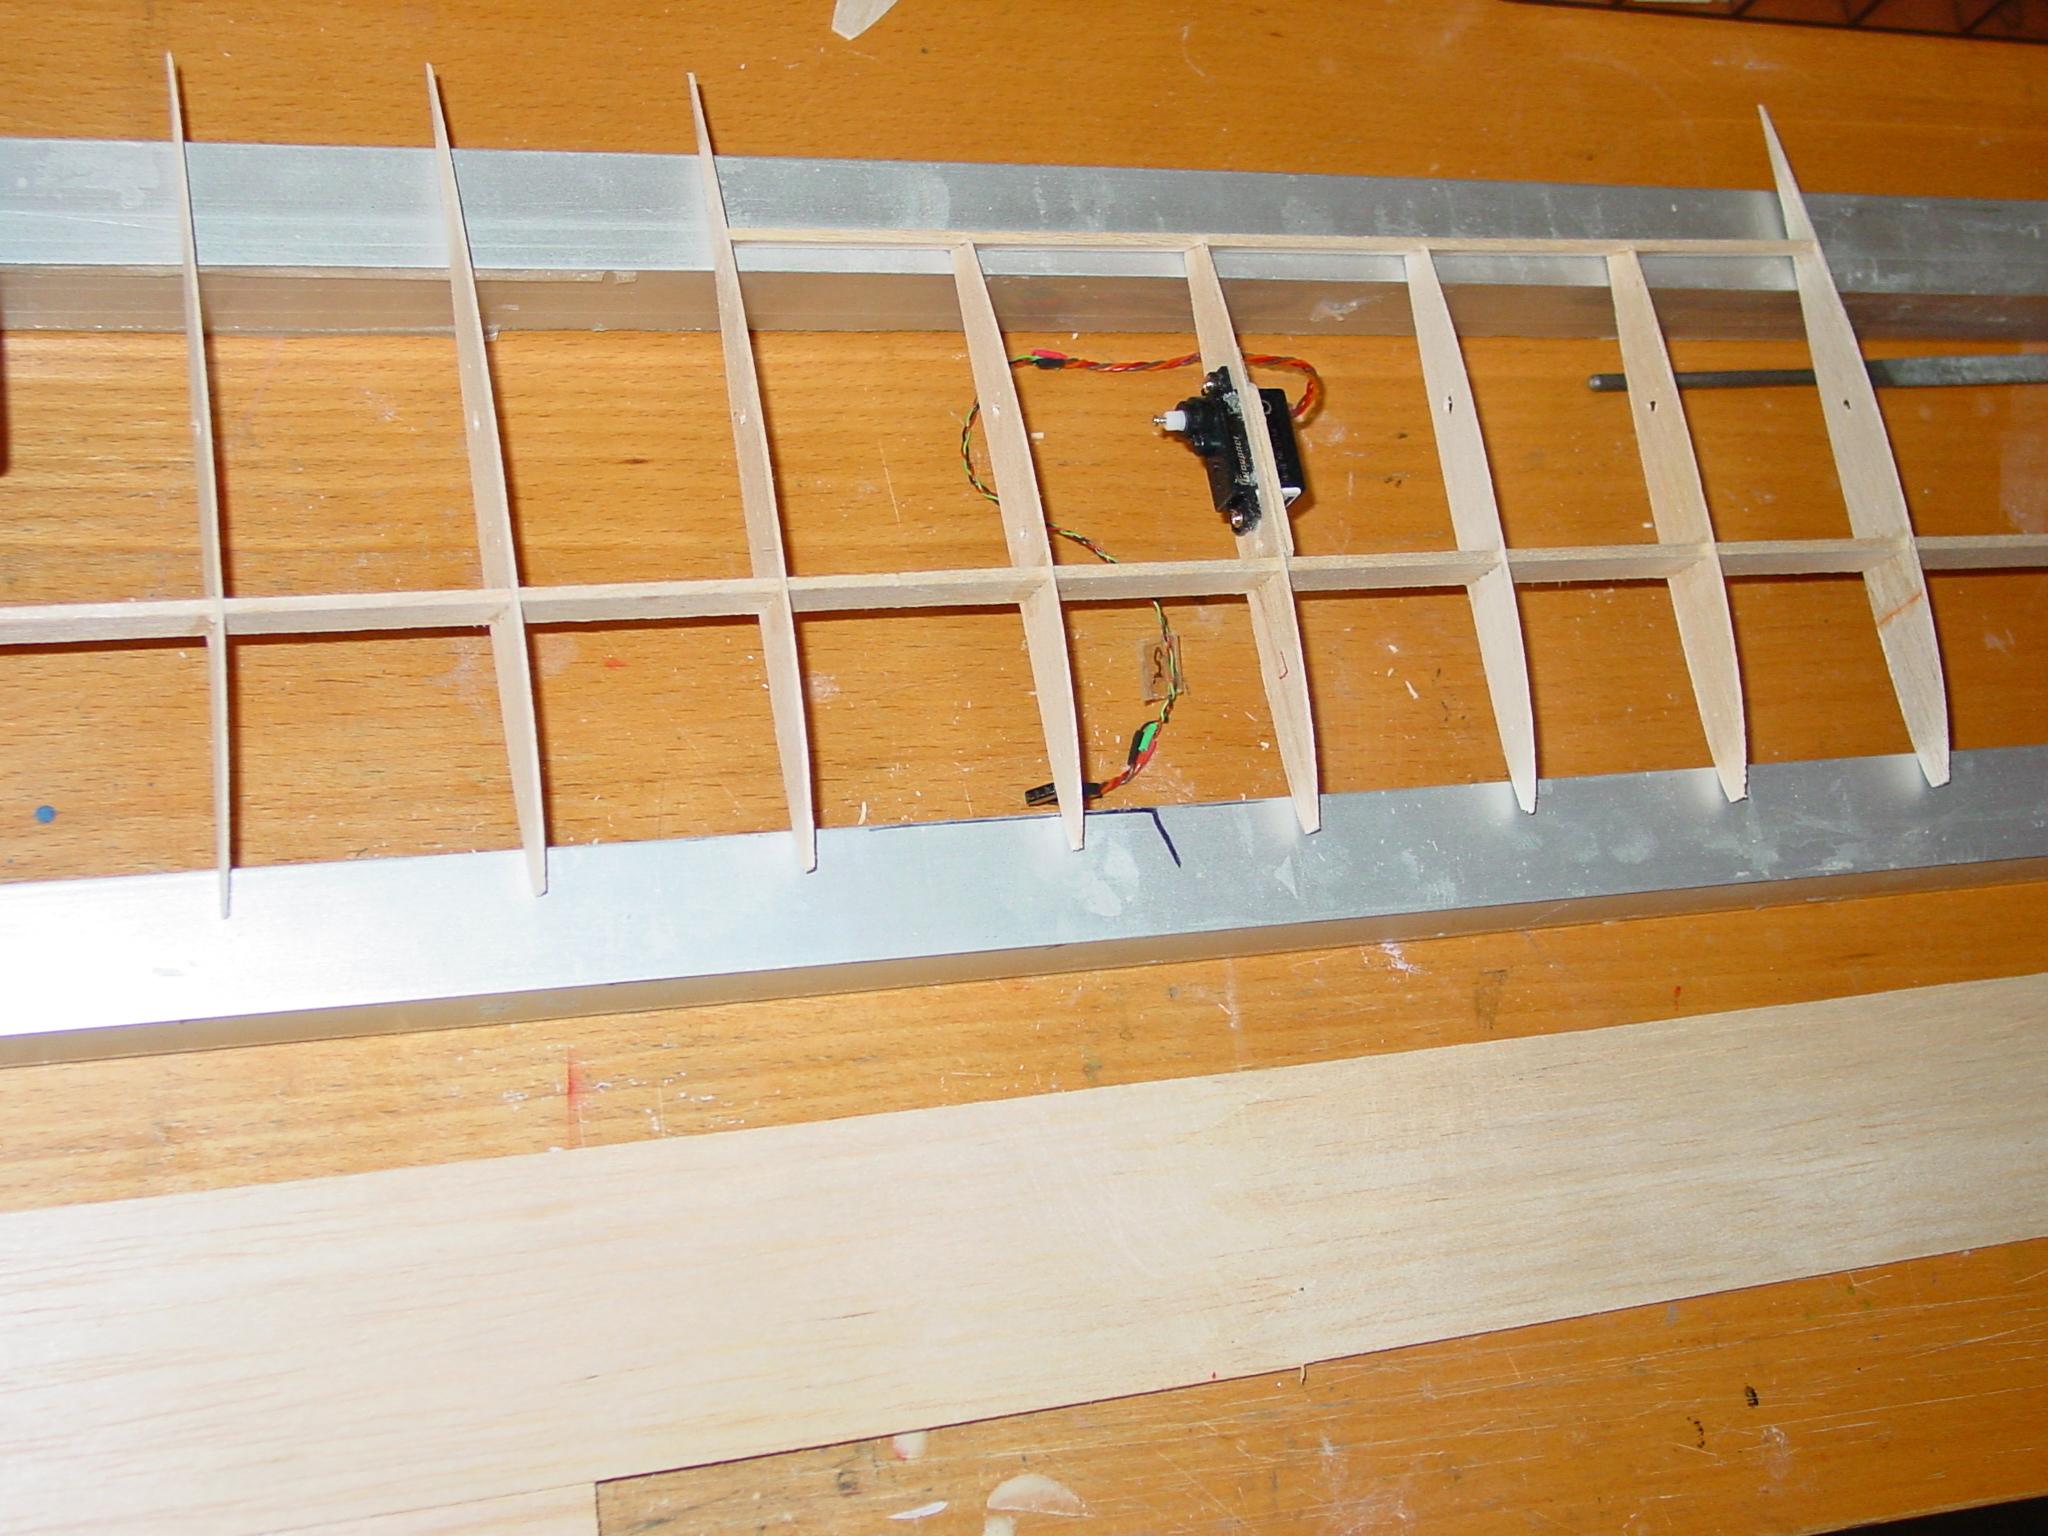 einfaches motorflugzeug selbst gebaut. Black Bedroom Furniture Sets. Home Design Ideas